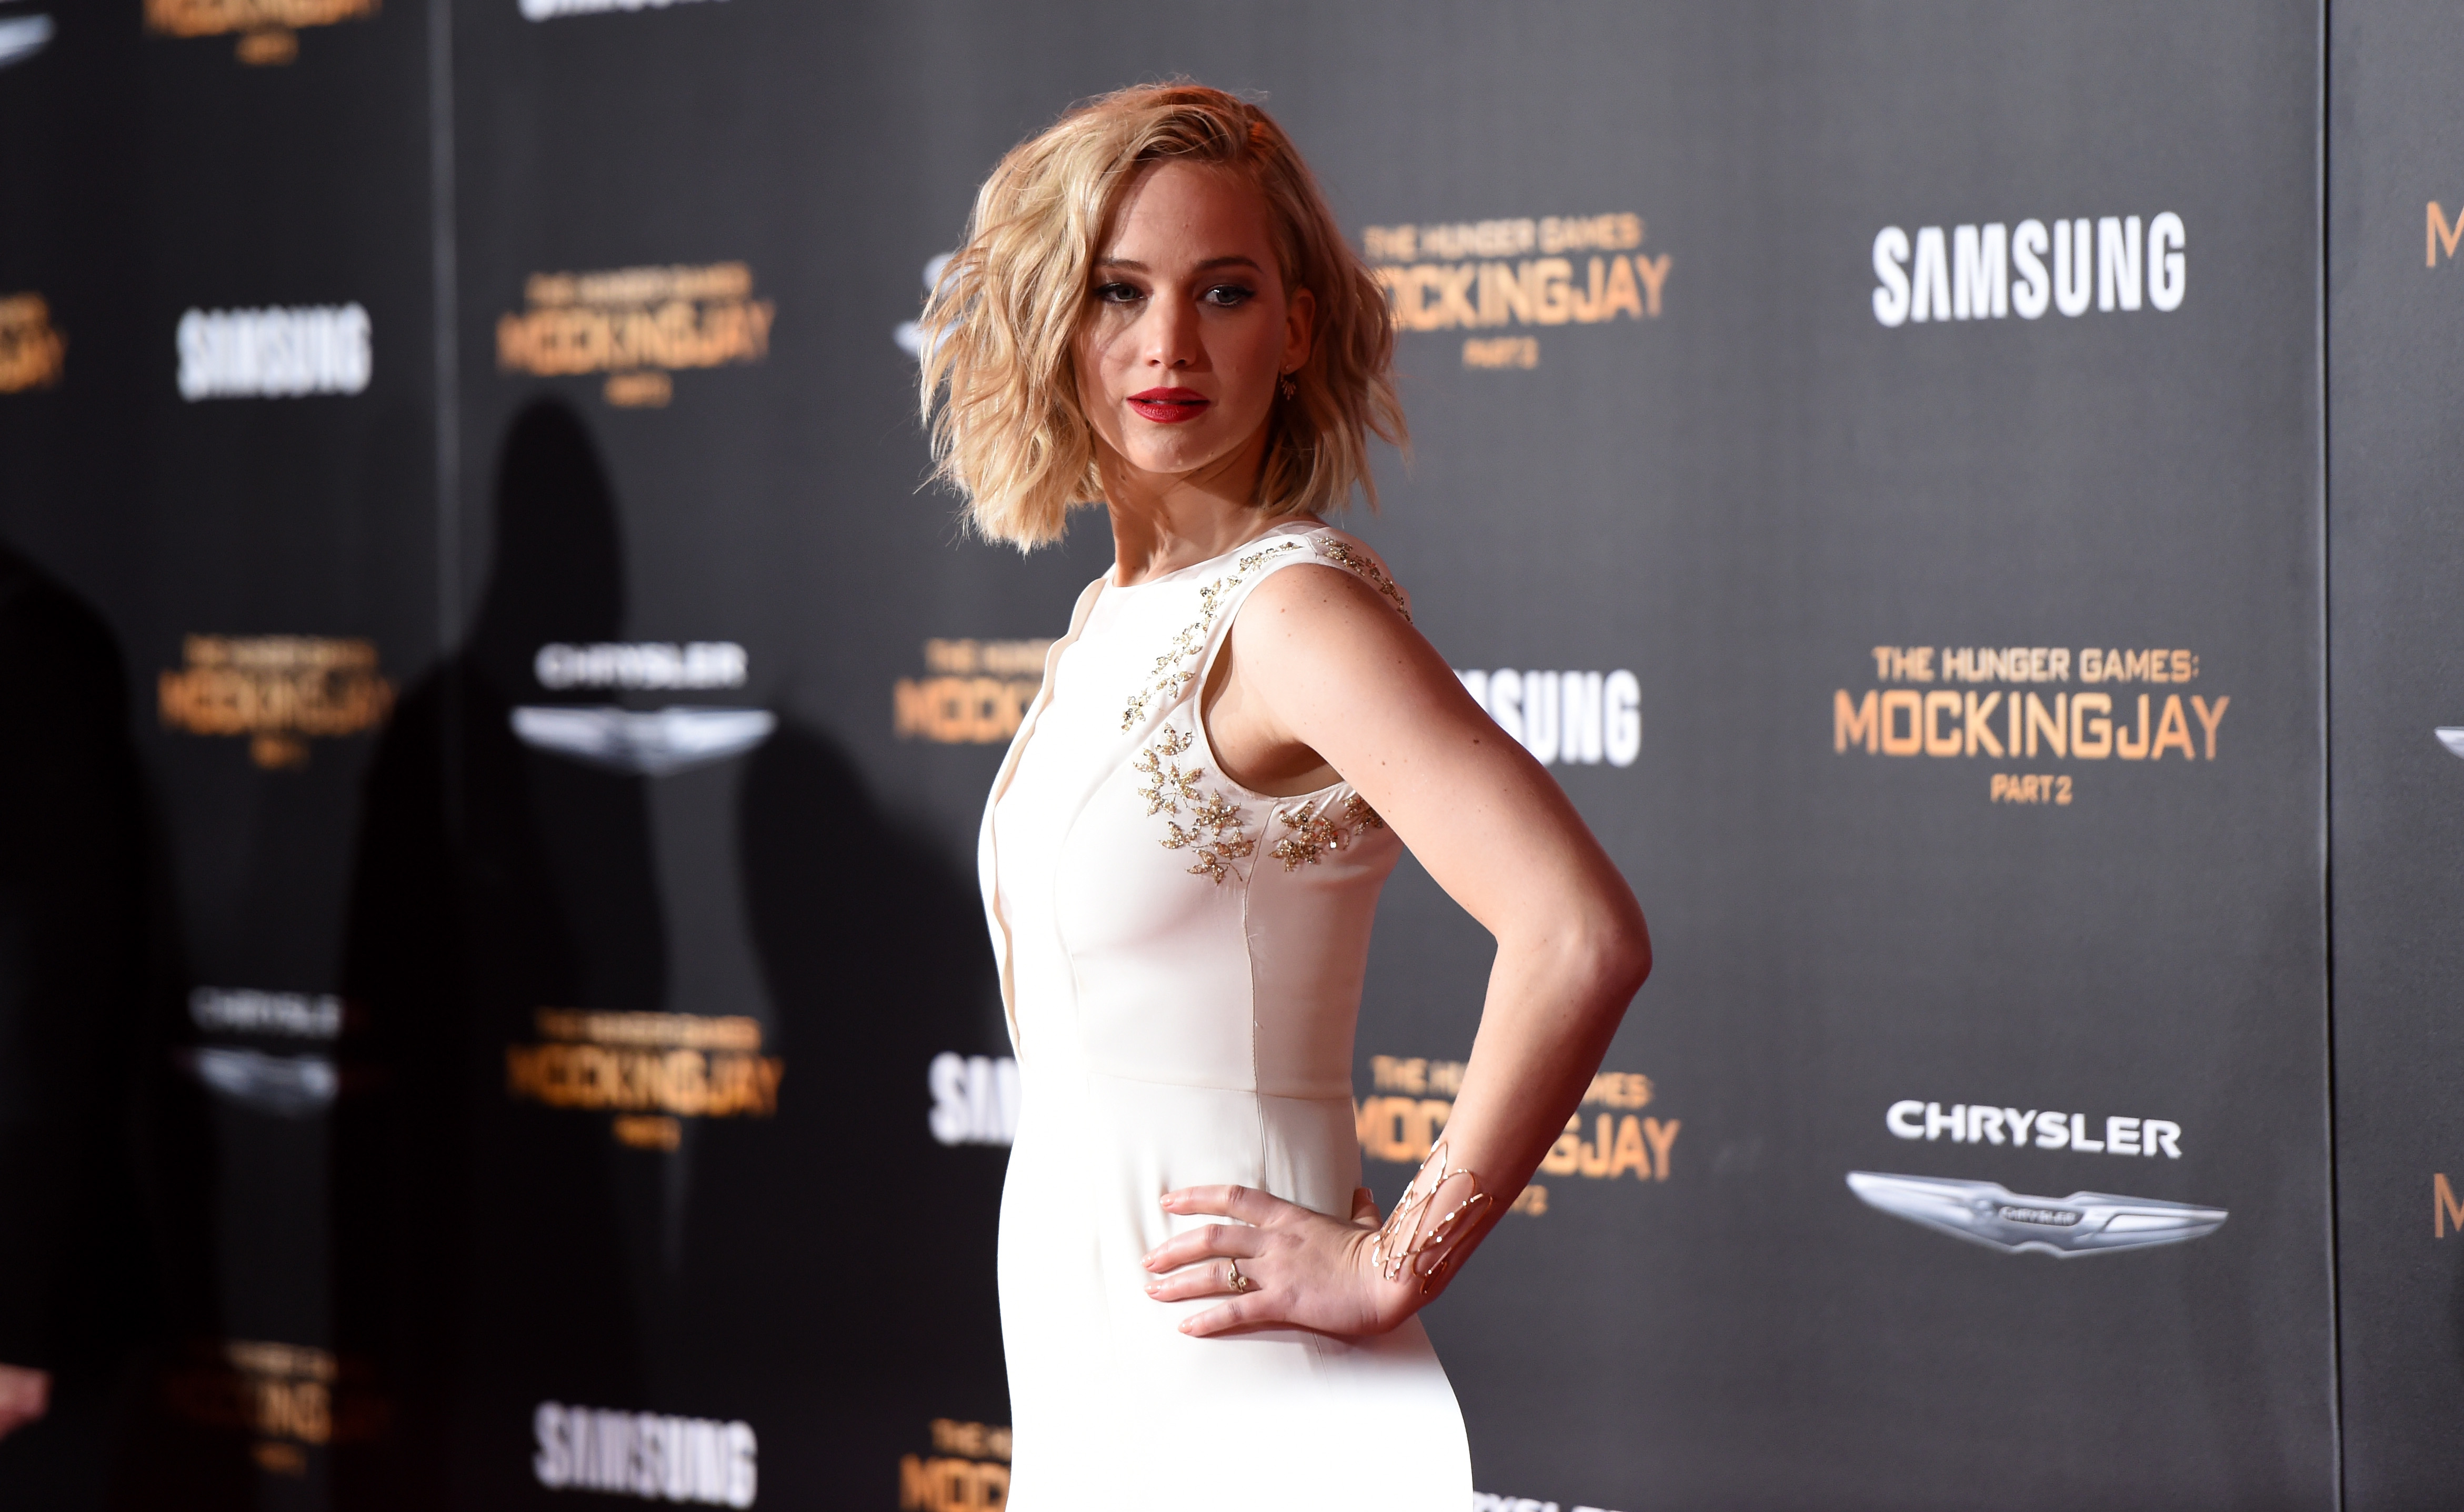 Jennifer Lawrence findet Chris Pratt süß   desired.de